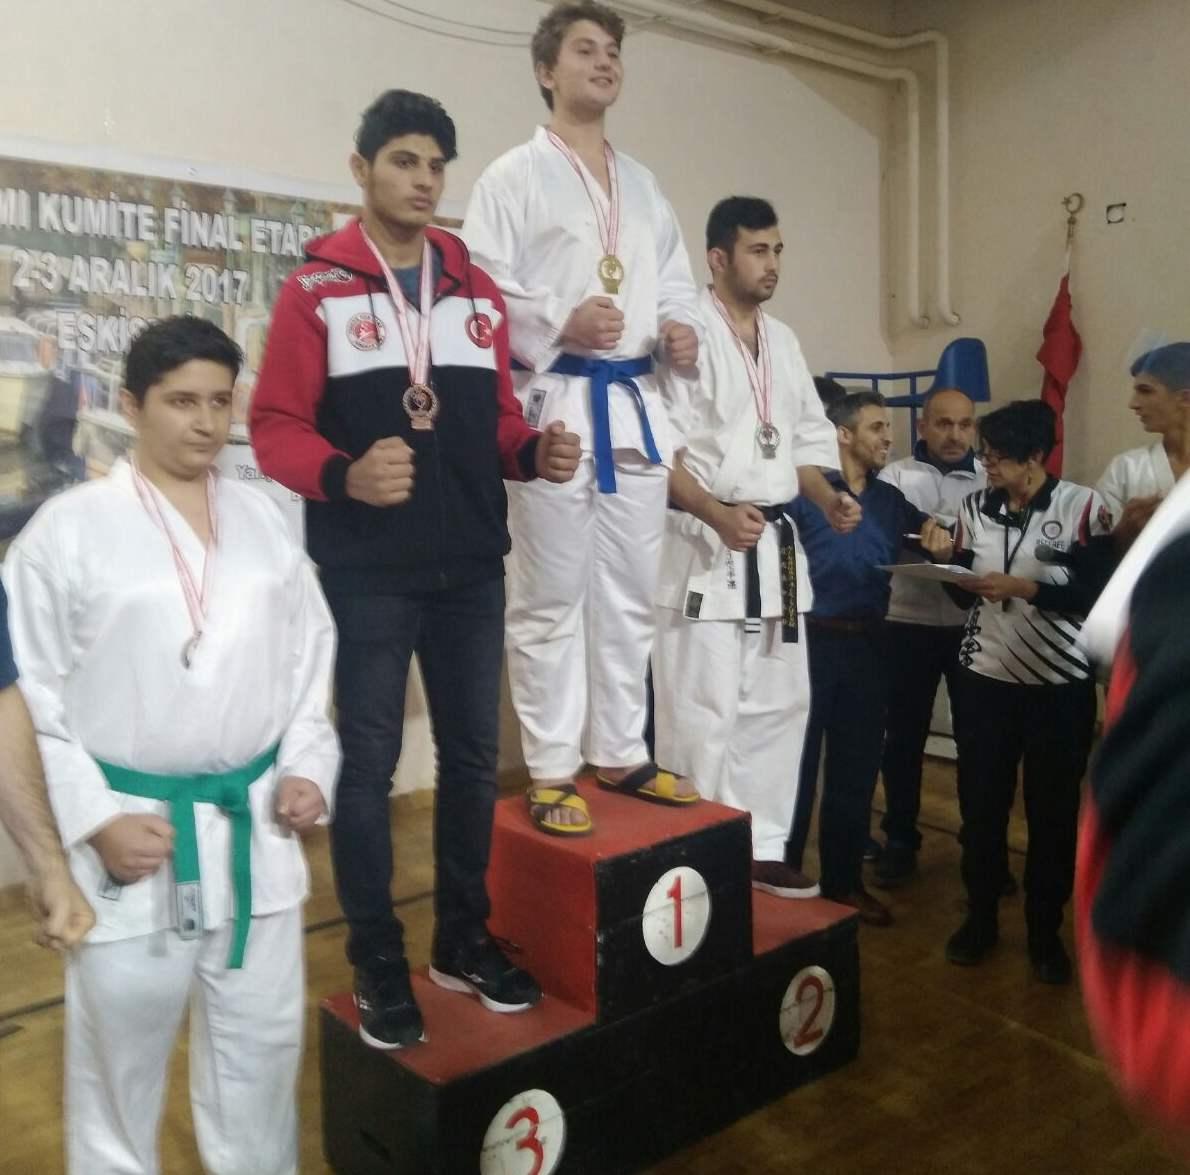 İllerarası Wushu Kyokushin Karate Final Müsabakası